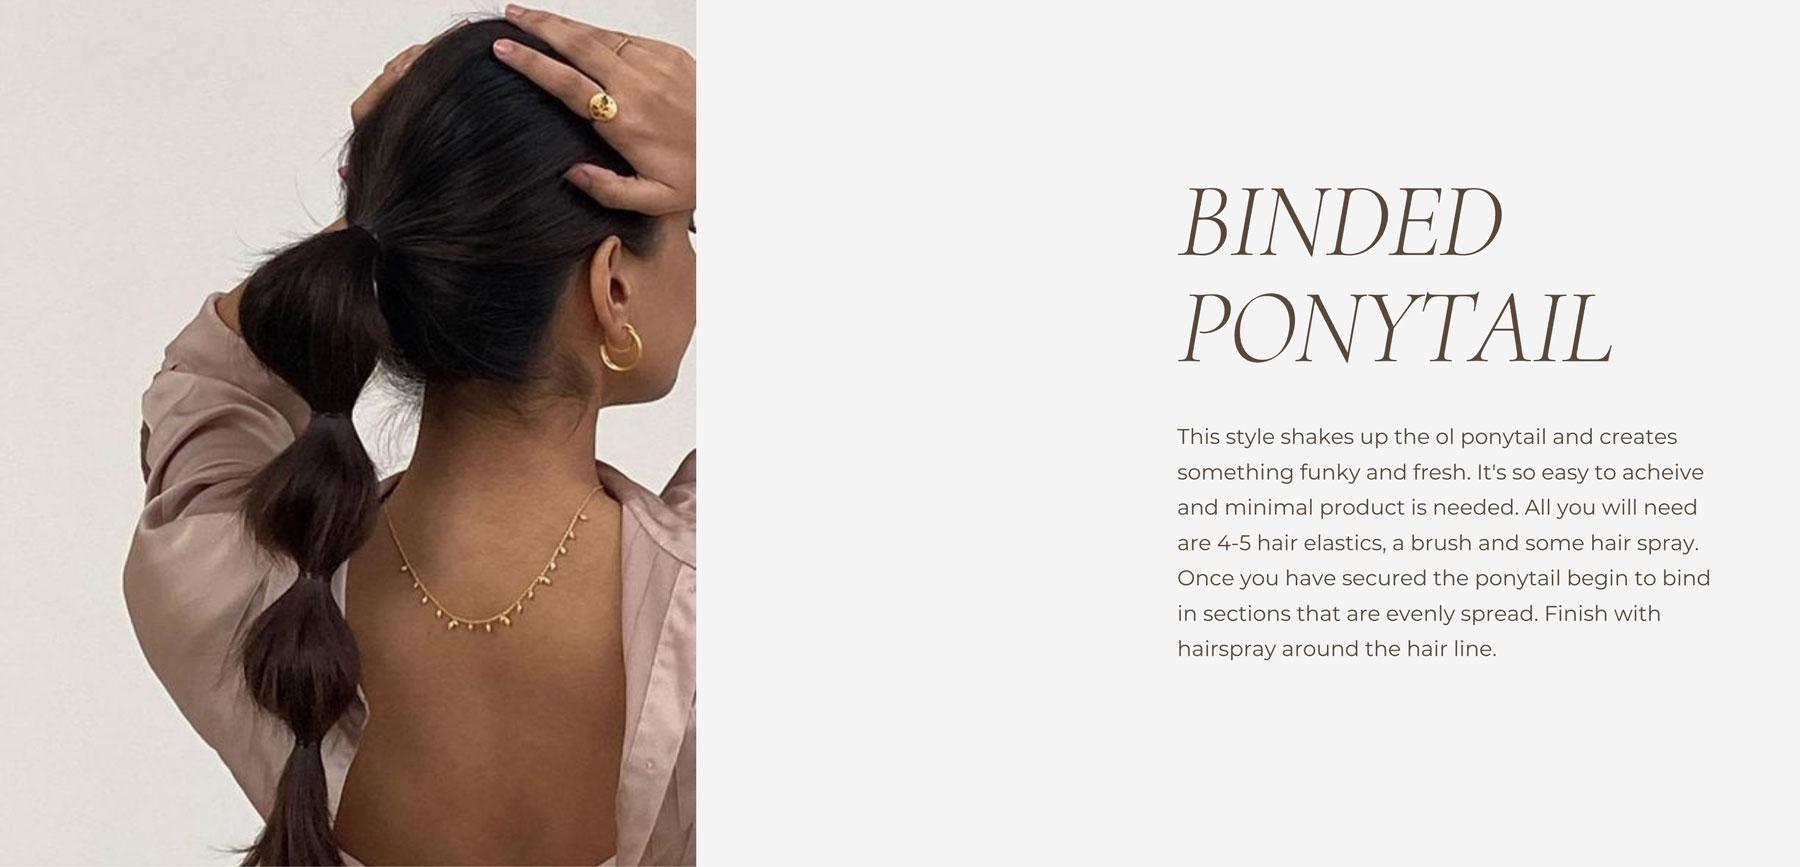 Binded Ponytail